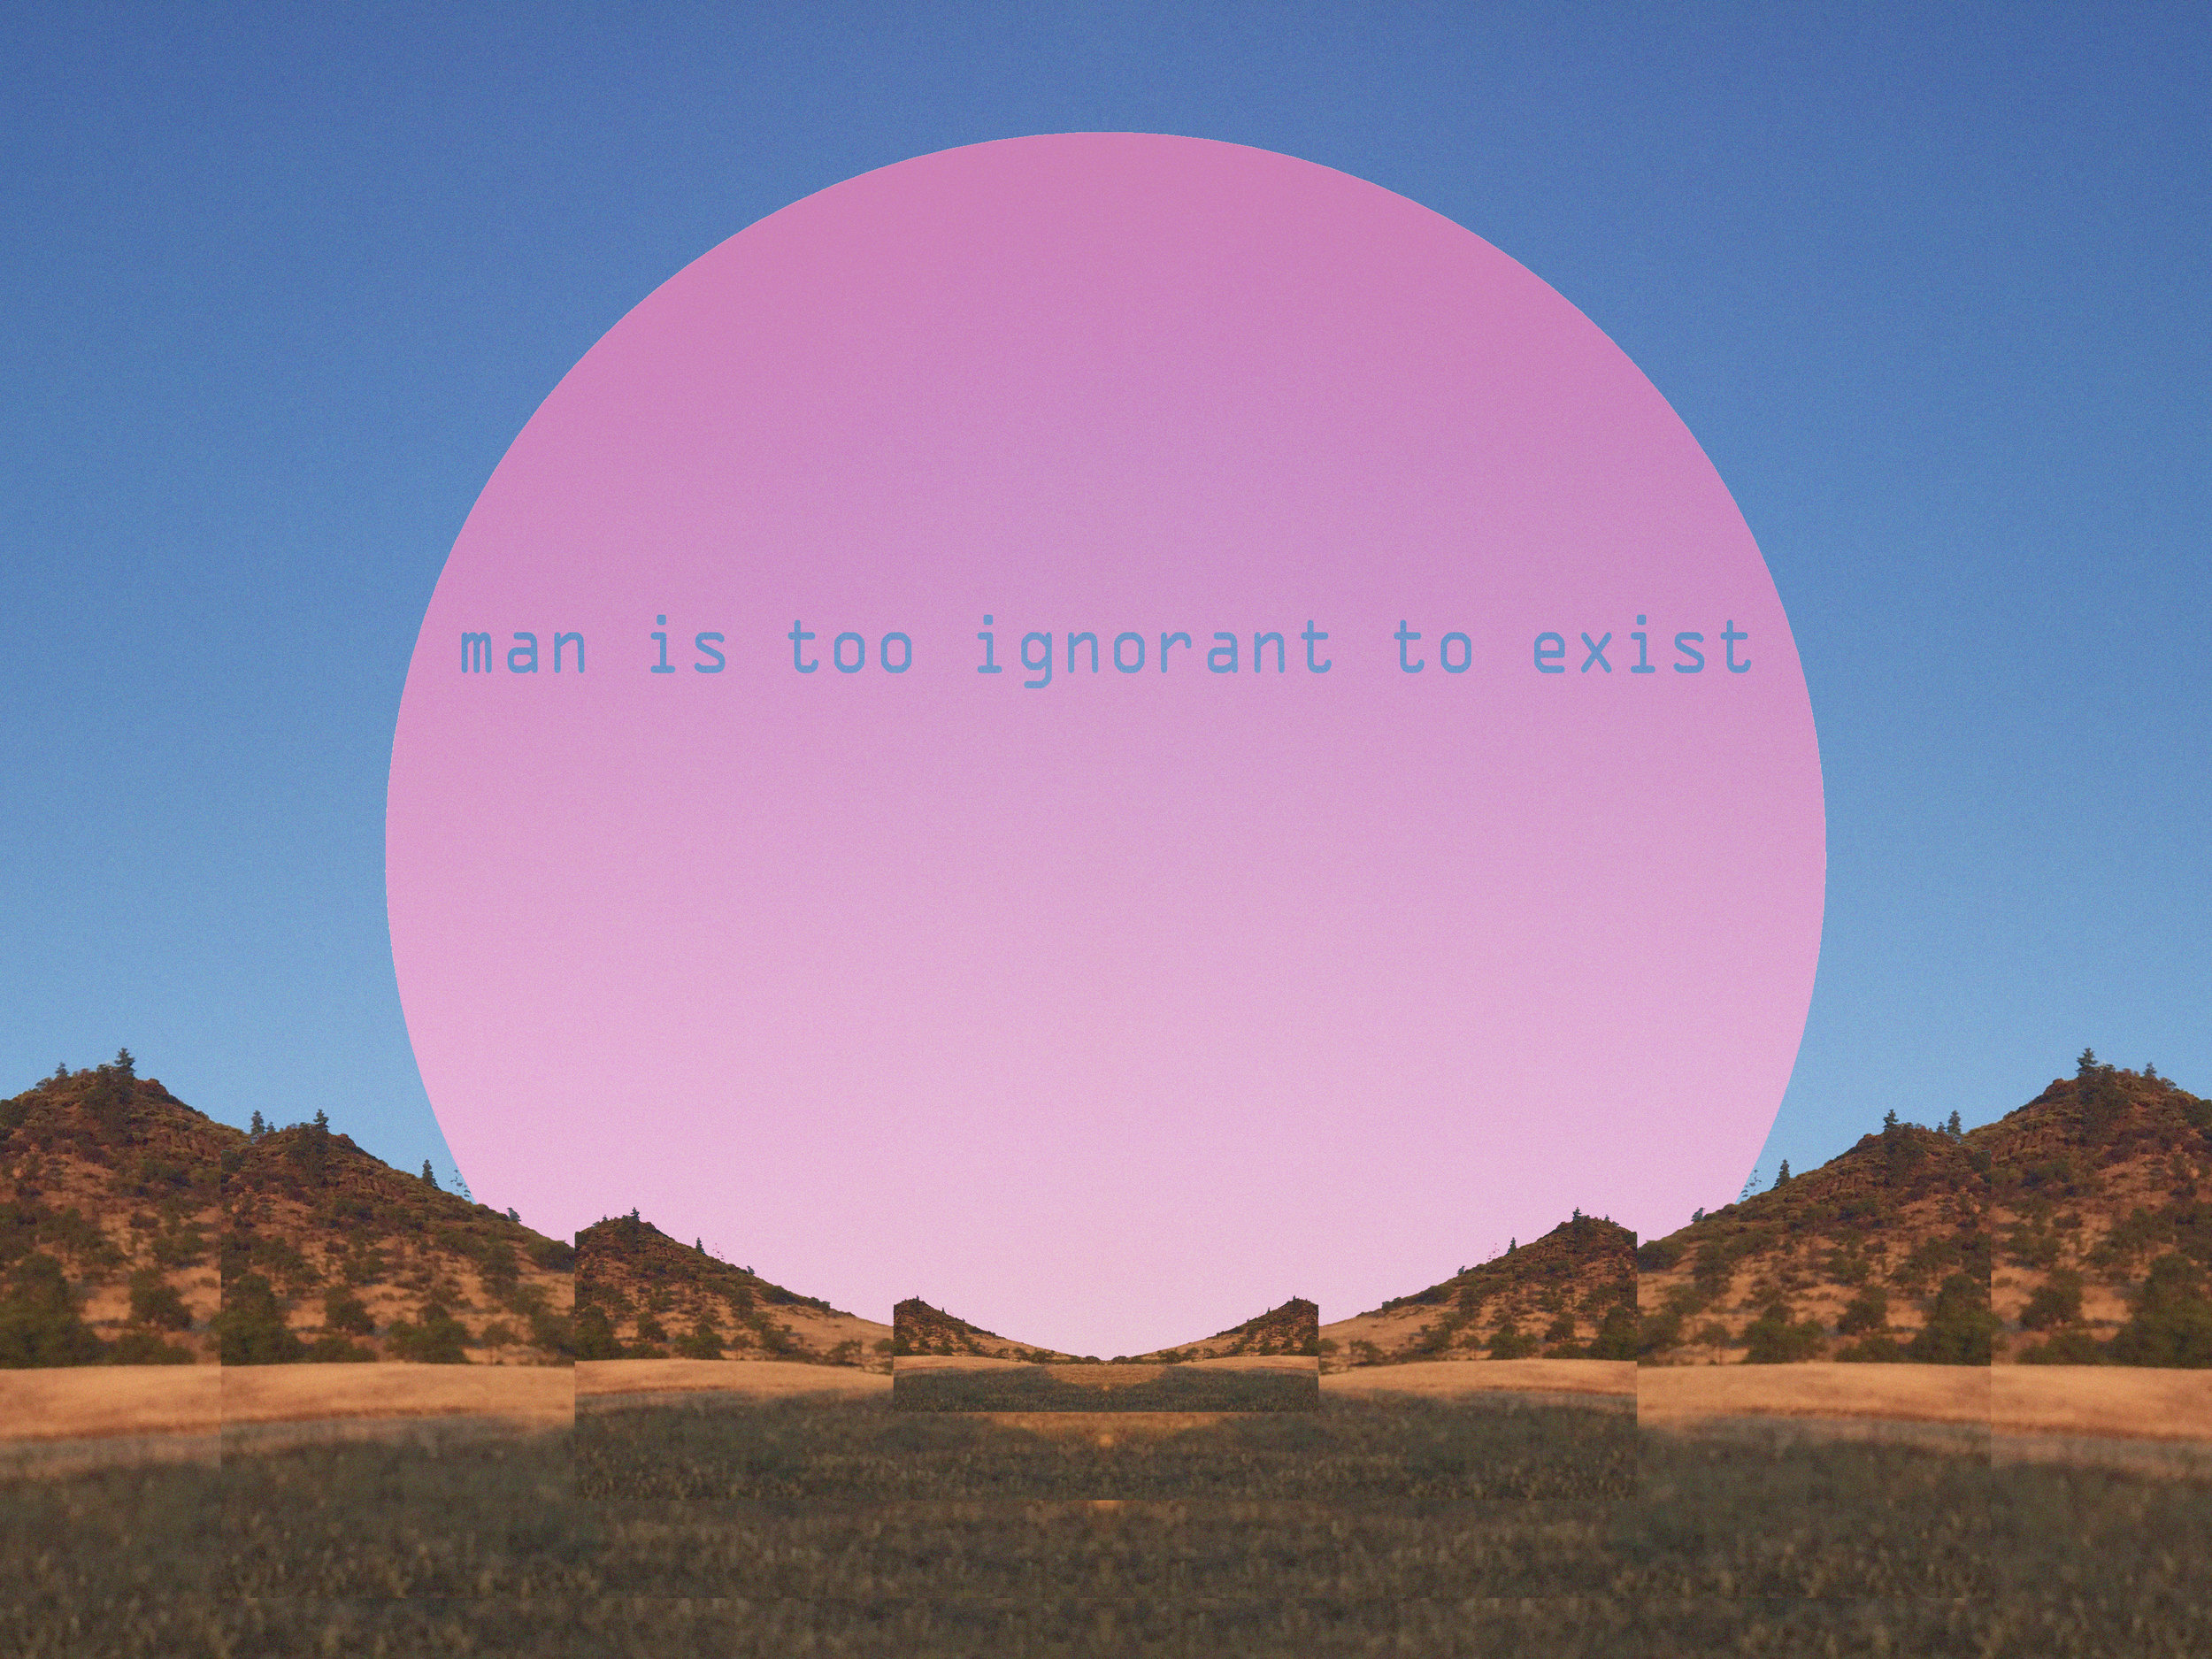 man is too ignorant to exist.jpg